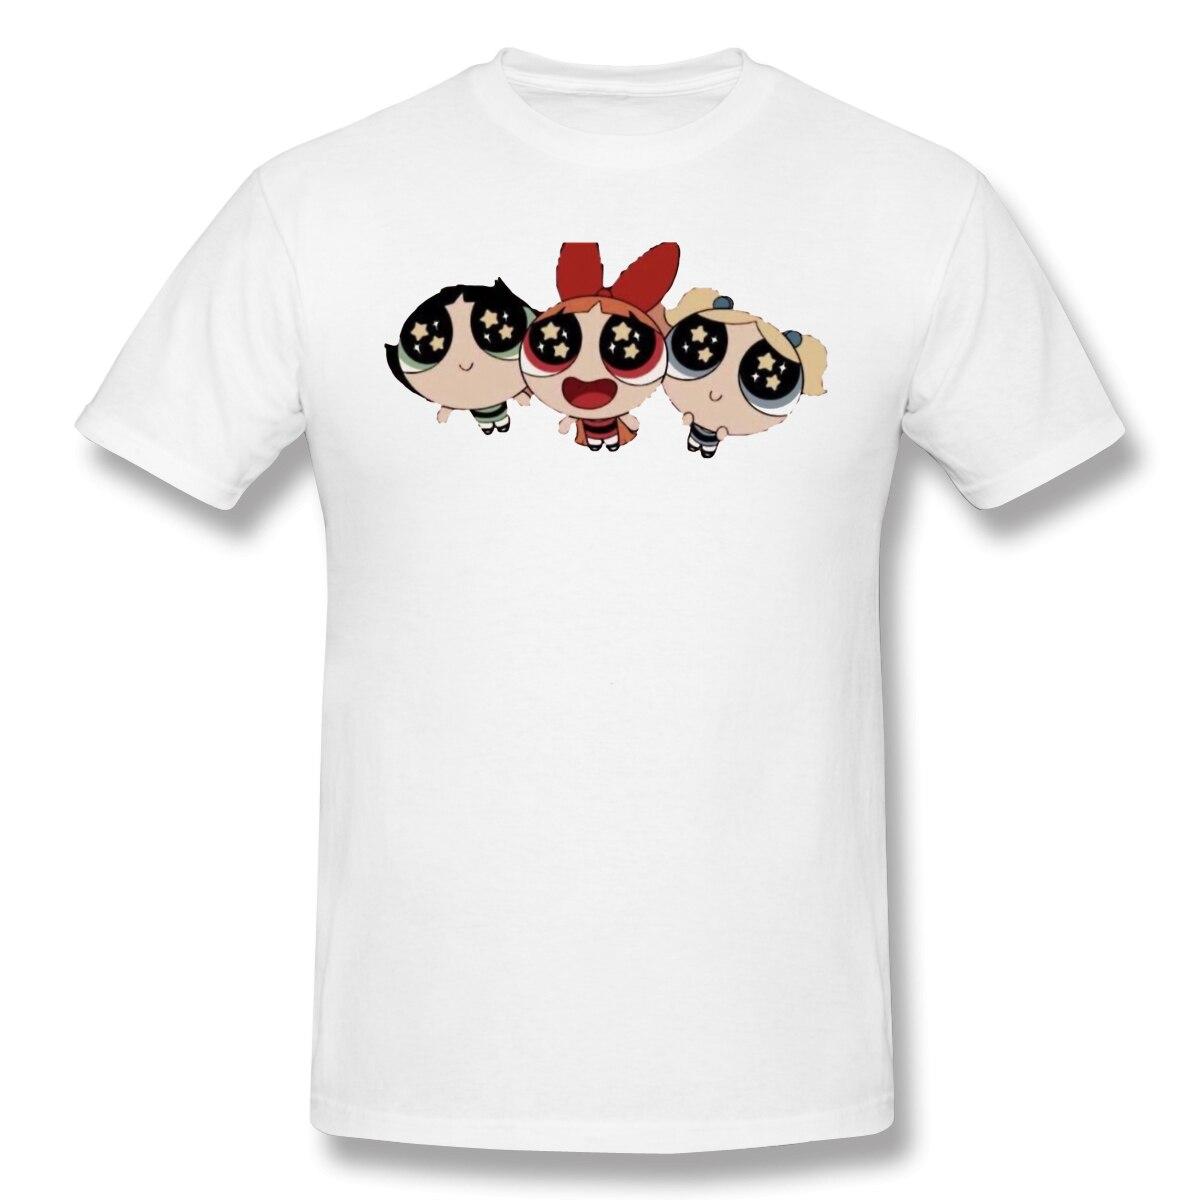 TrioT-Shirt Men Top Quality 100% Cotton Short Summer Sleeve powerpuff girls Casual Tshirt Loose